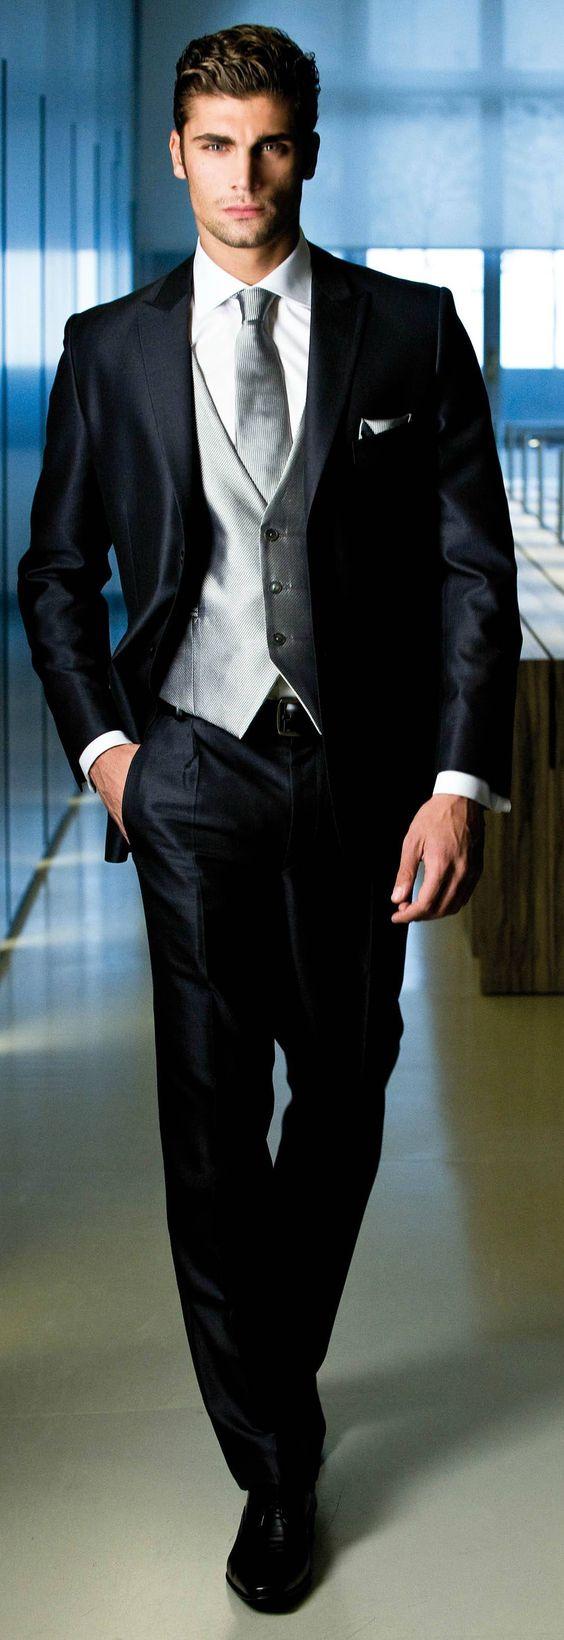 Awesome black formal suit for men